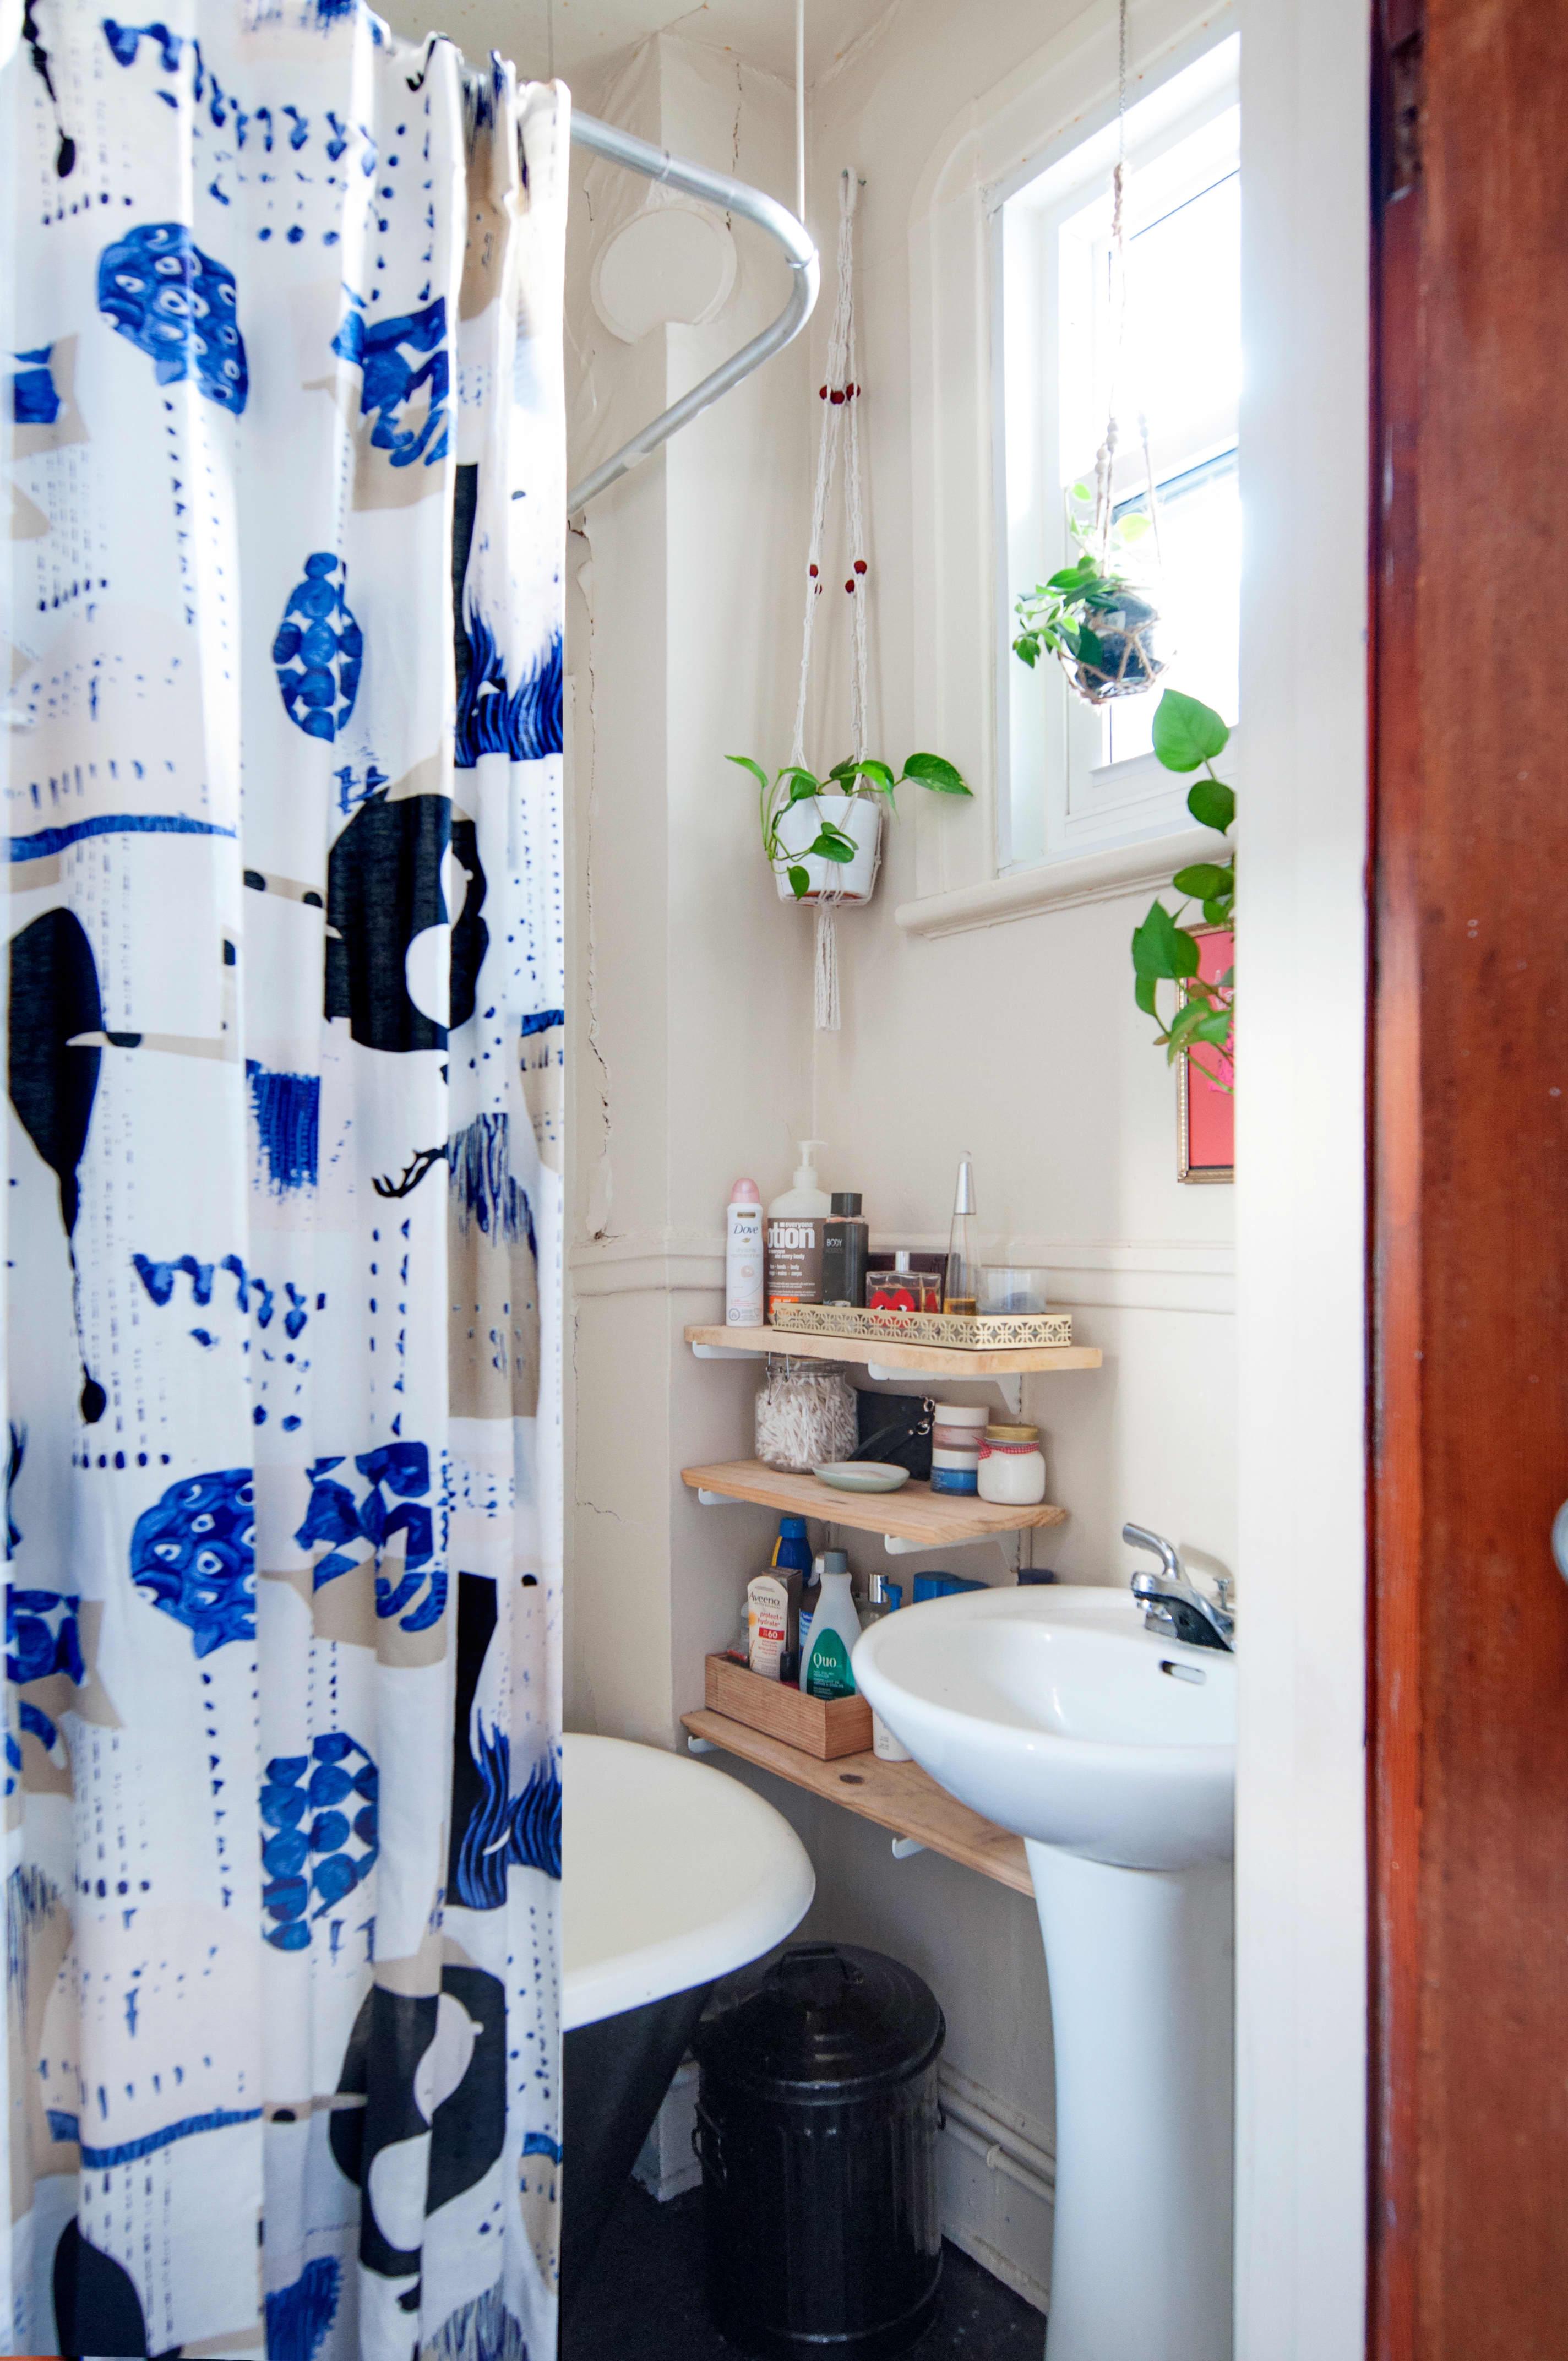 Small Bathroom Design & Storage Ideas | Apartment Therapy on Small Apartment Bathroom Storage Ideas  id=59992